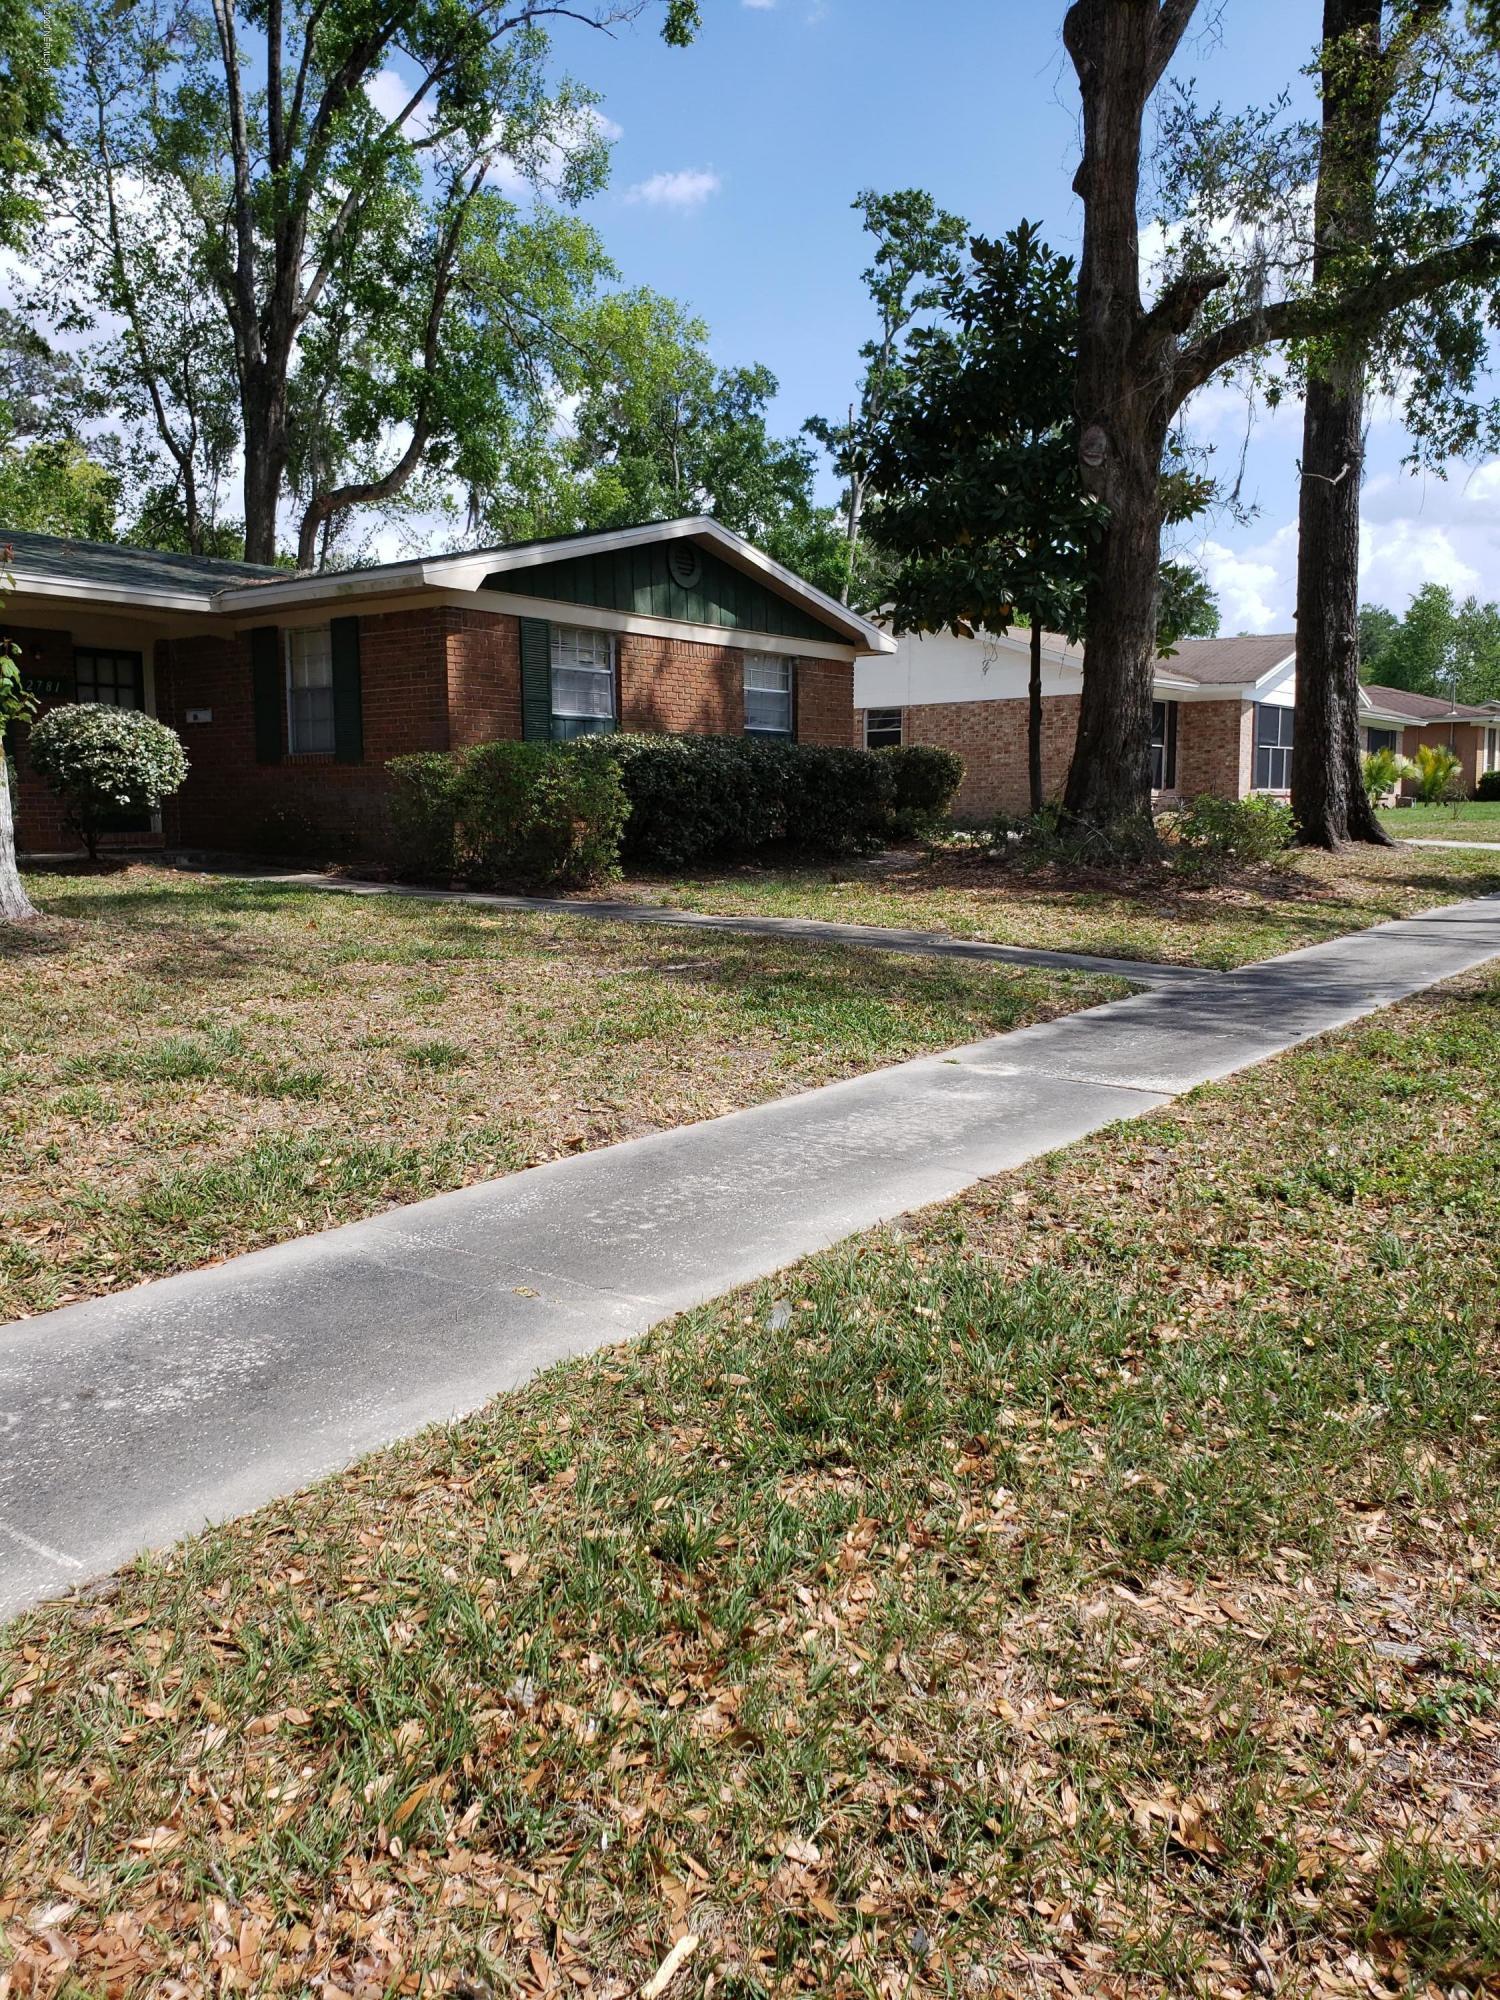 2781 GREENRIDGE, ORANGE PARK, FLORIDA 32073, 3 Bedrooms Bedrooms, ,2 BathroomsBathrooms,Residential,For sale,GREENRIDGE,1045846